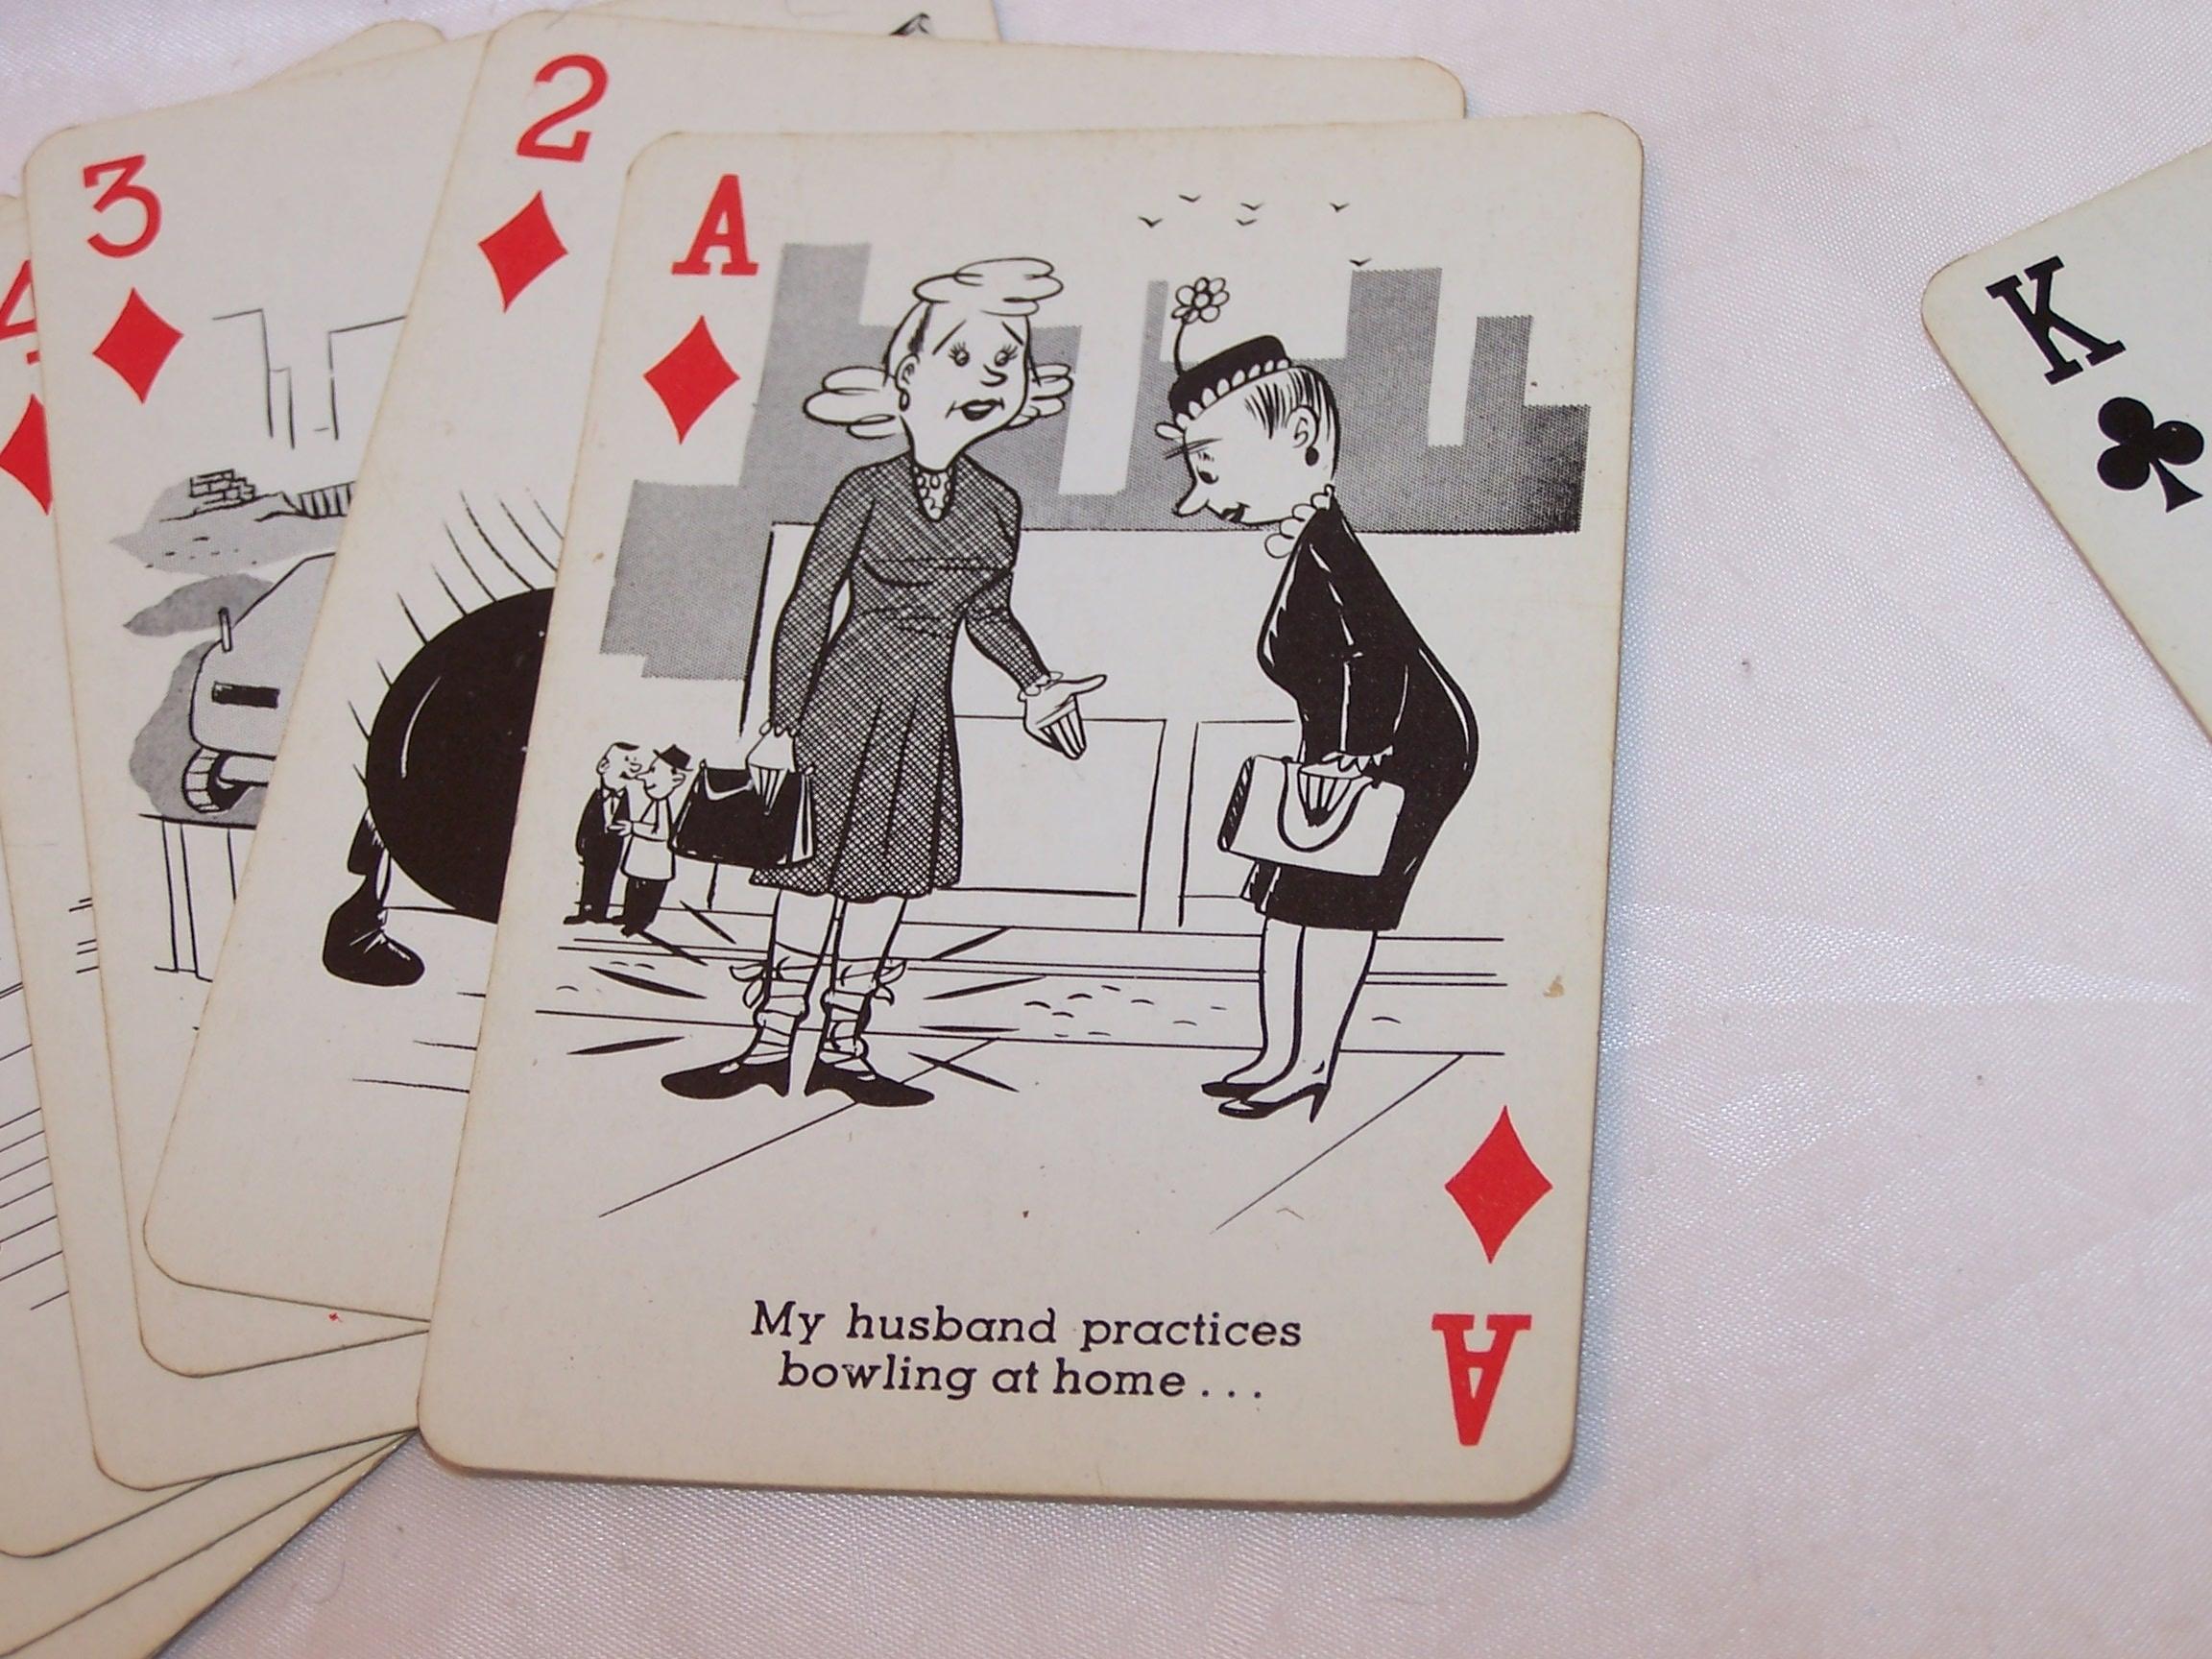 Image 4 of Playing Cards Bowling Jokes, Poker Size, Vntg Orig Pkg